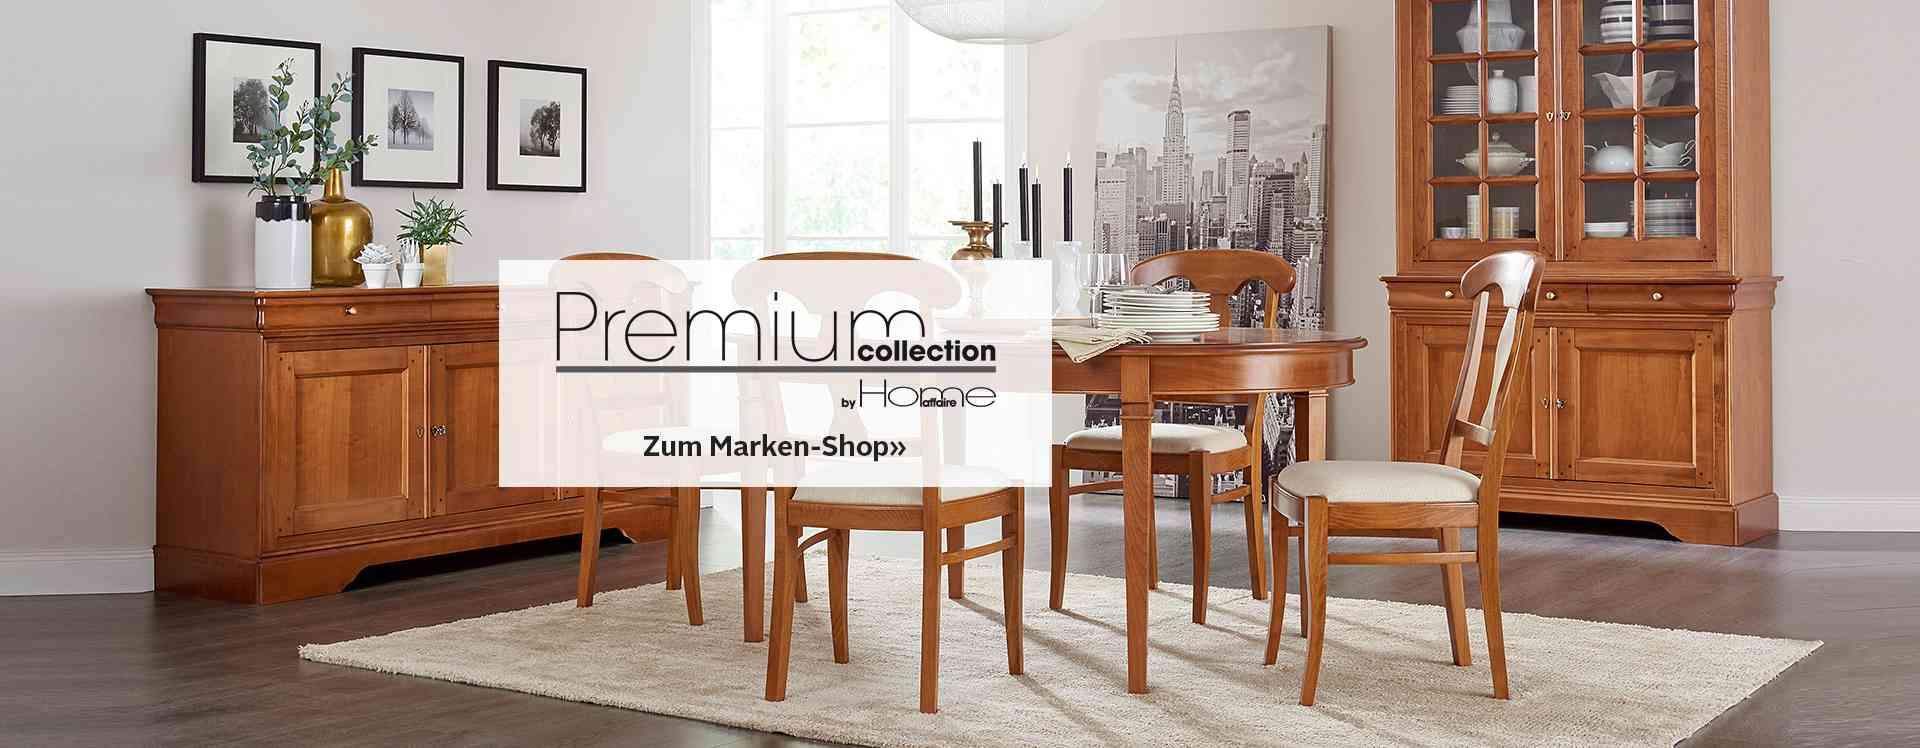 premium collection by home affair online kaufen otto. Black Bedroom Furniture Sets. Home Design Ideas